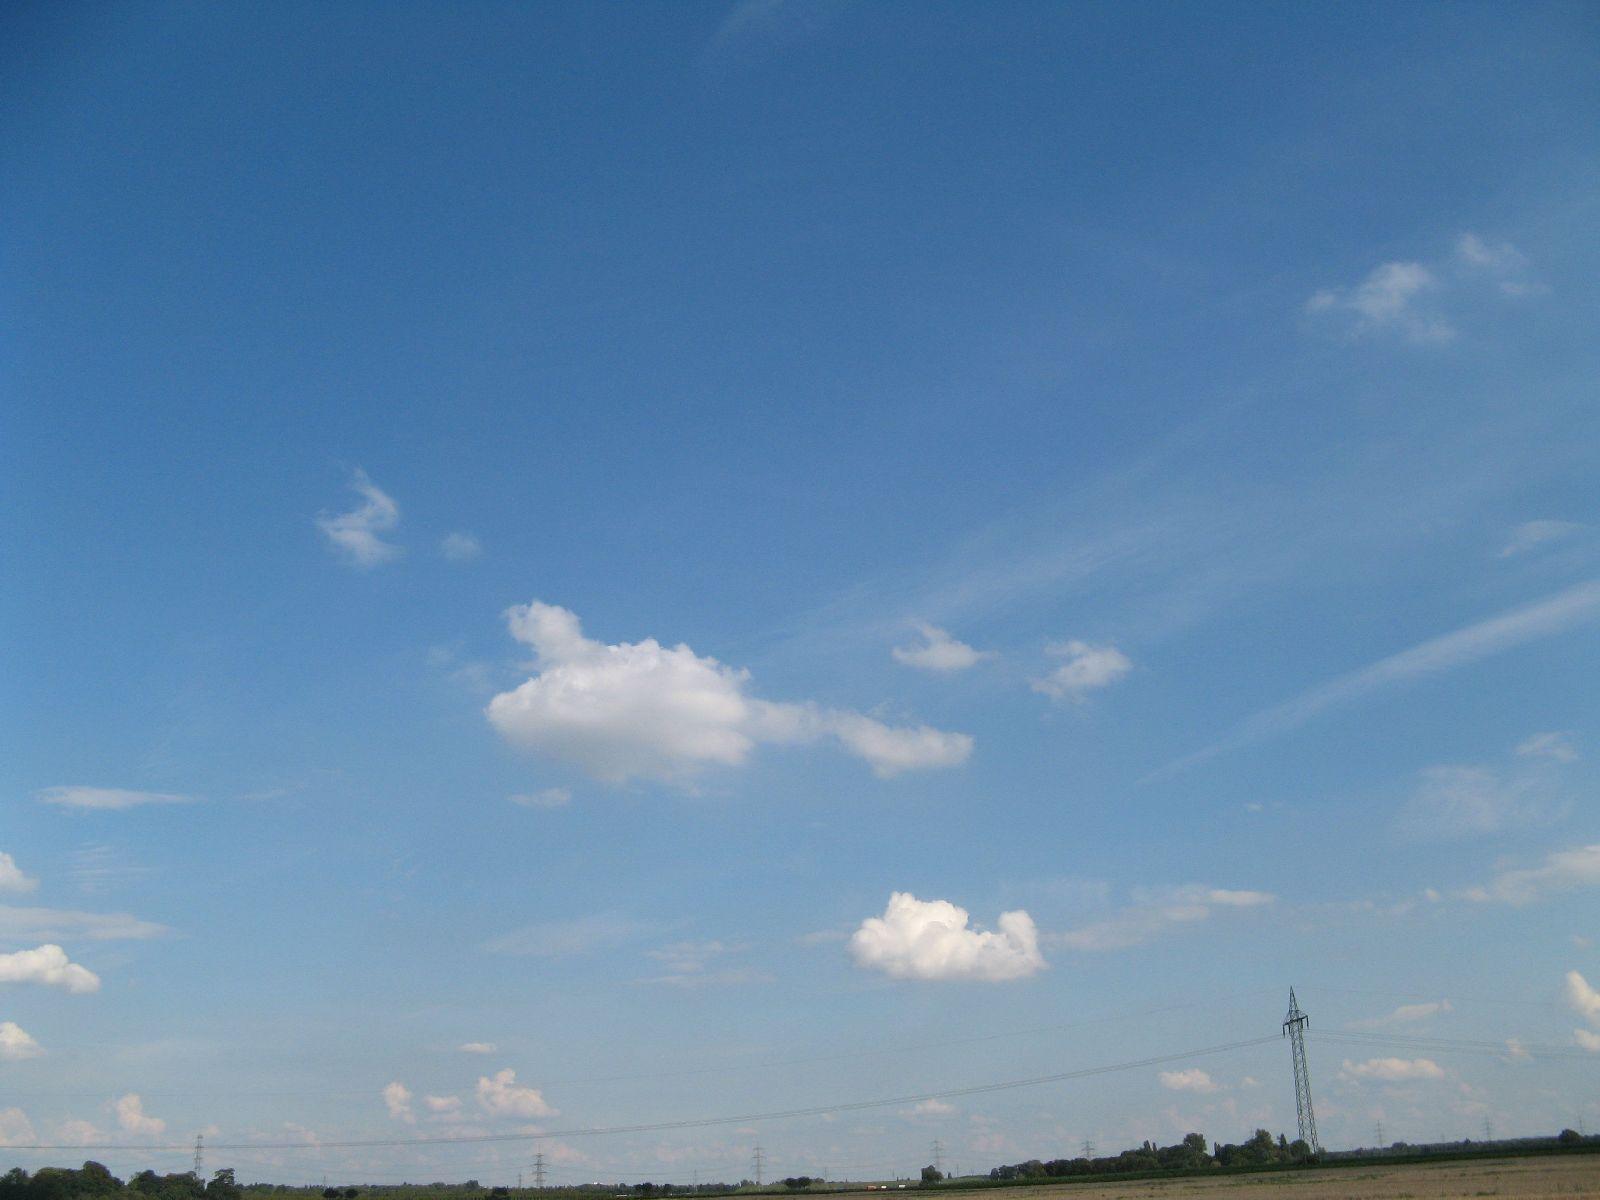 Himmel-Wolken-Foto_Textur_B_2684